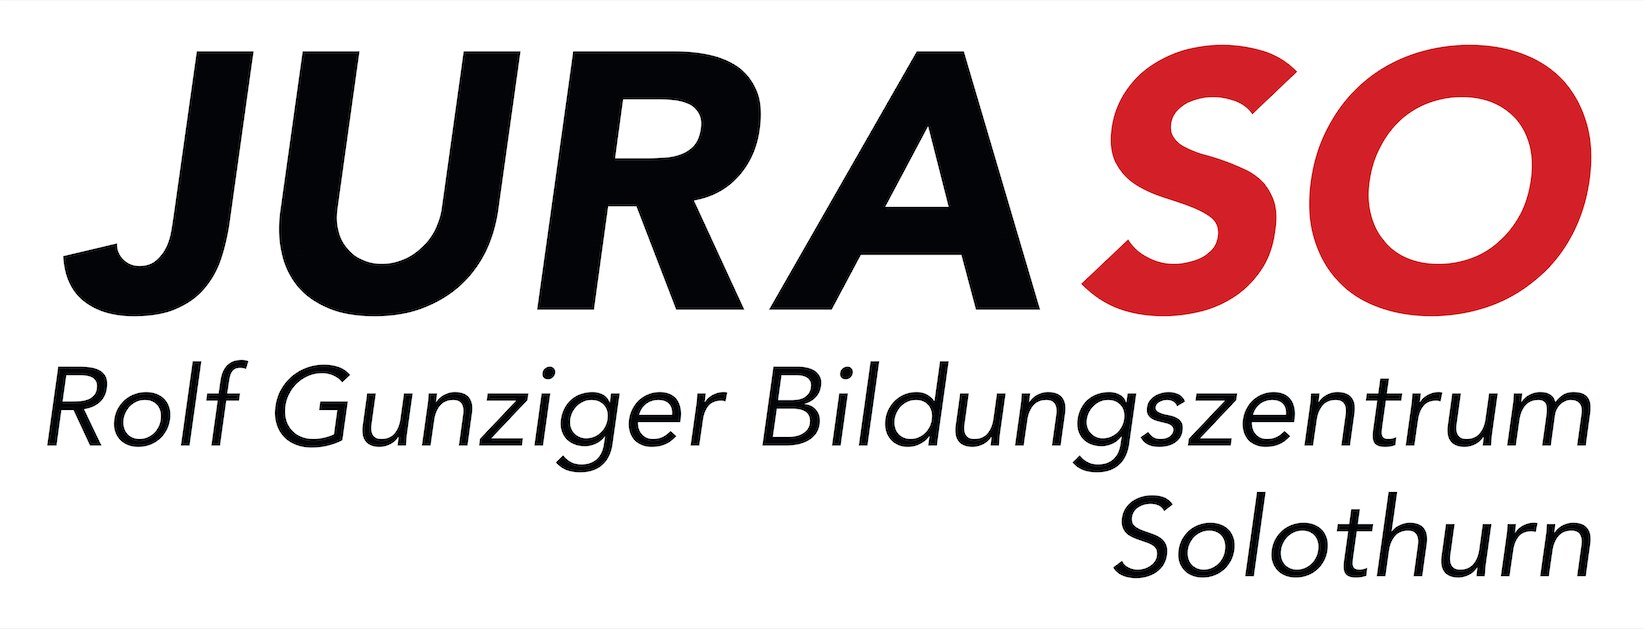 logo_jpg_100kbjpg